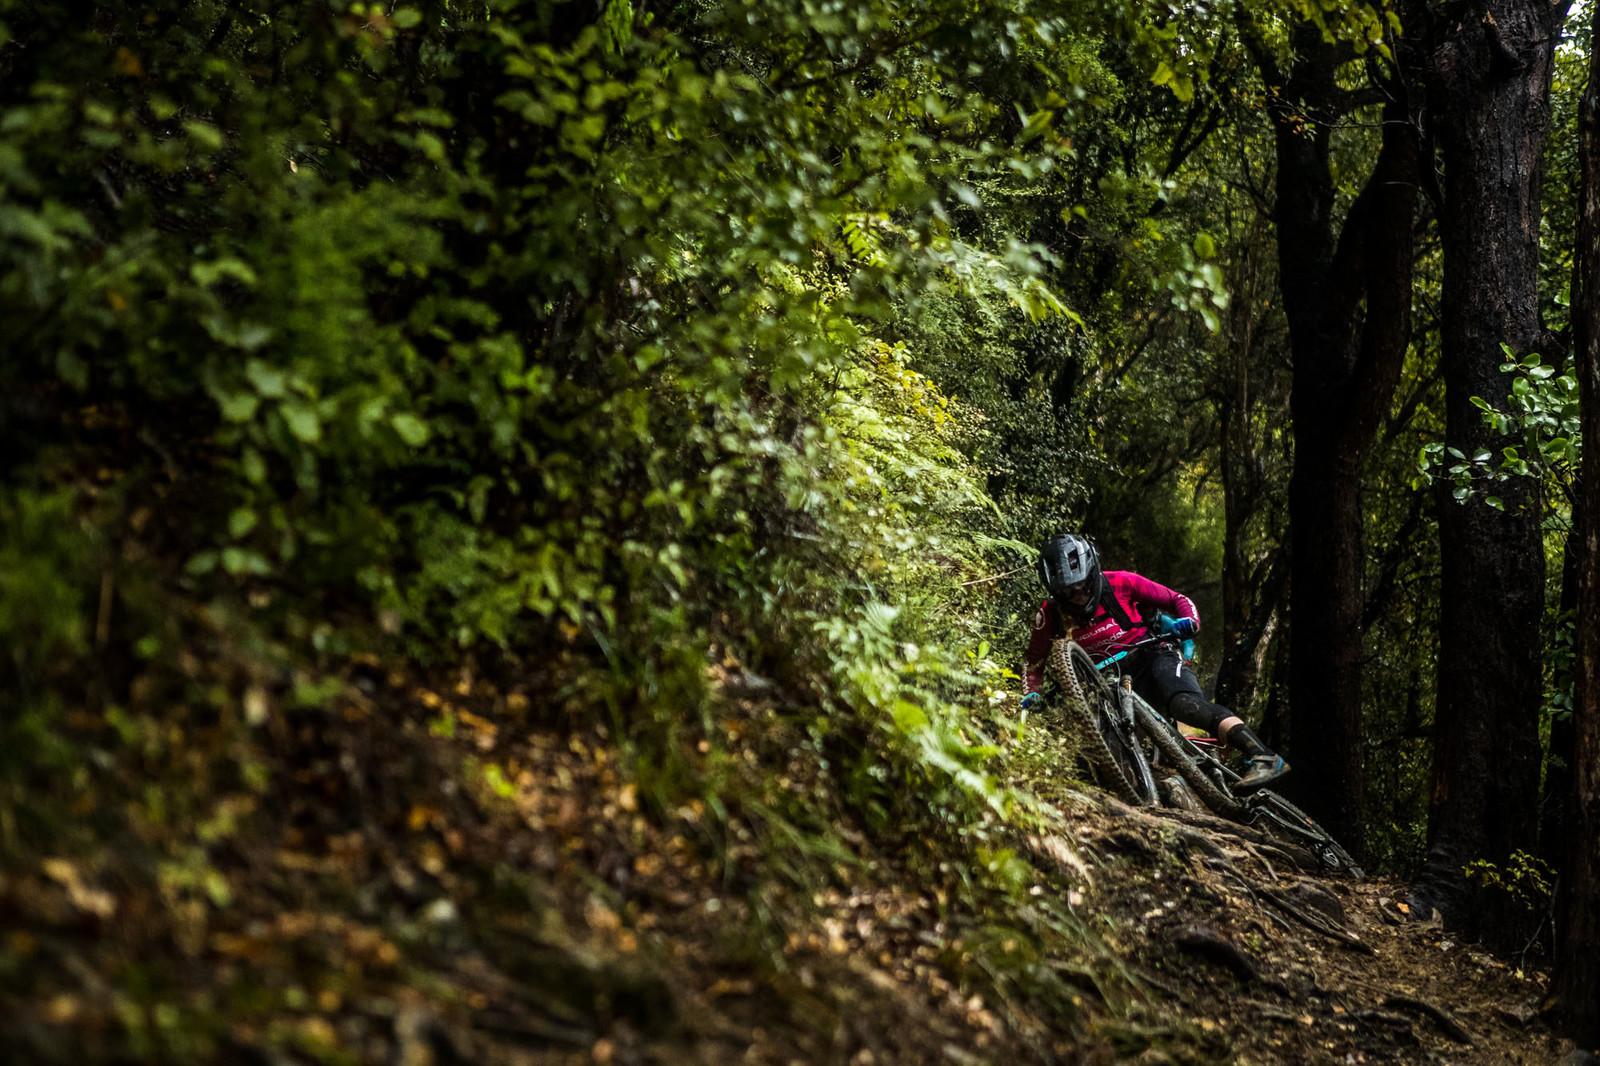 NZEnduro19 BB AS6I0439 - 2019 NZ Enduro Day 1 Photo Gallery - Mountain Biking Pictures - Vital MTB